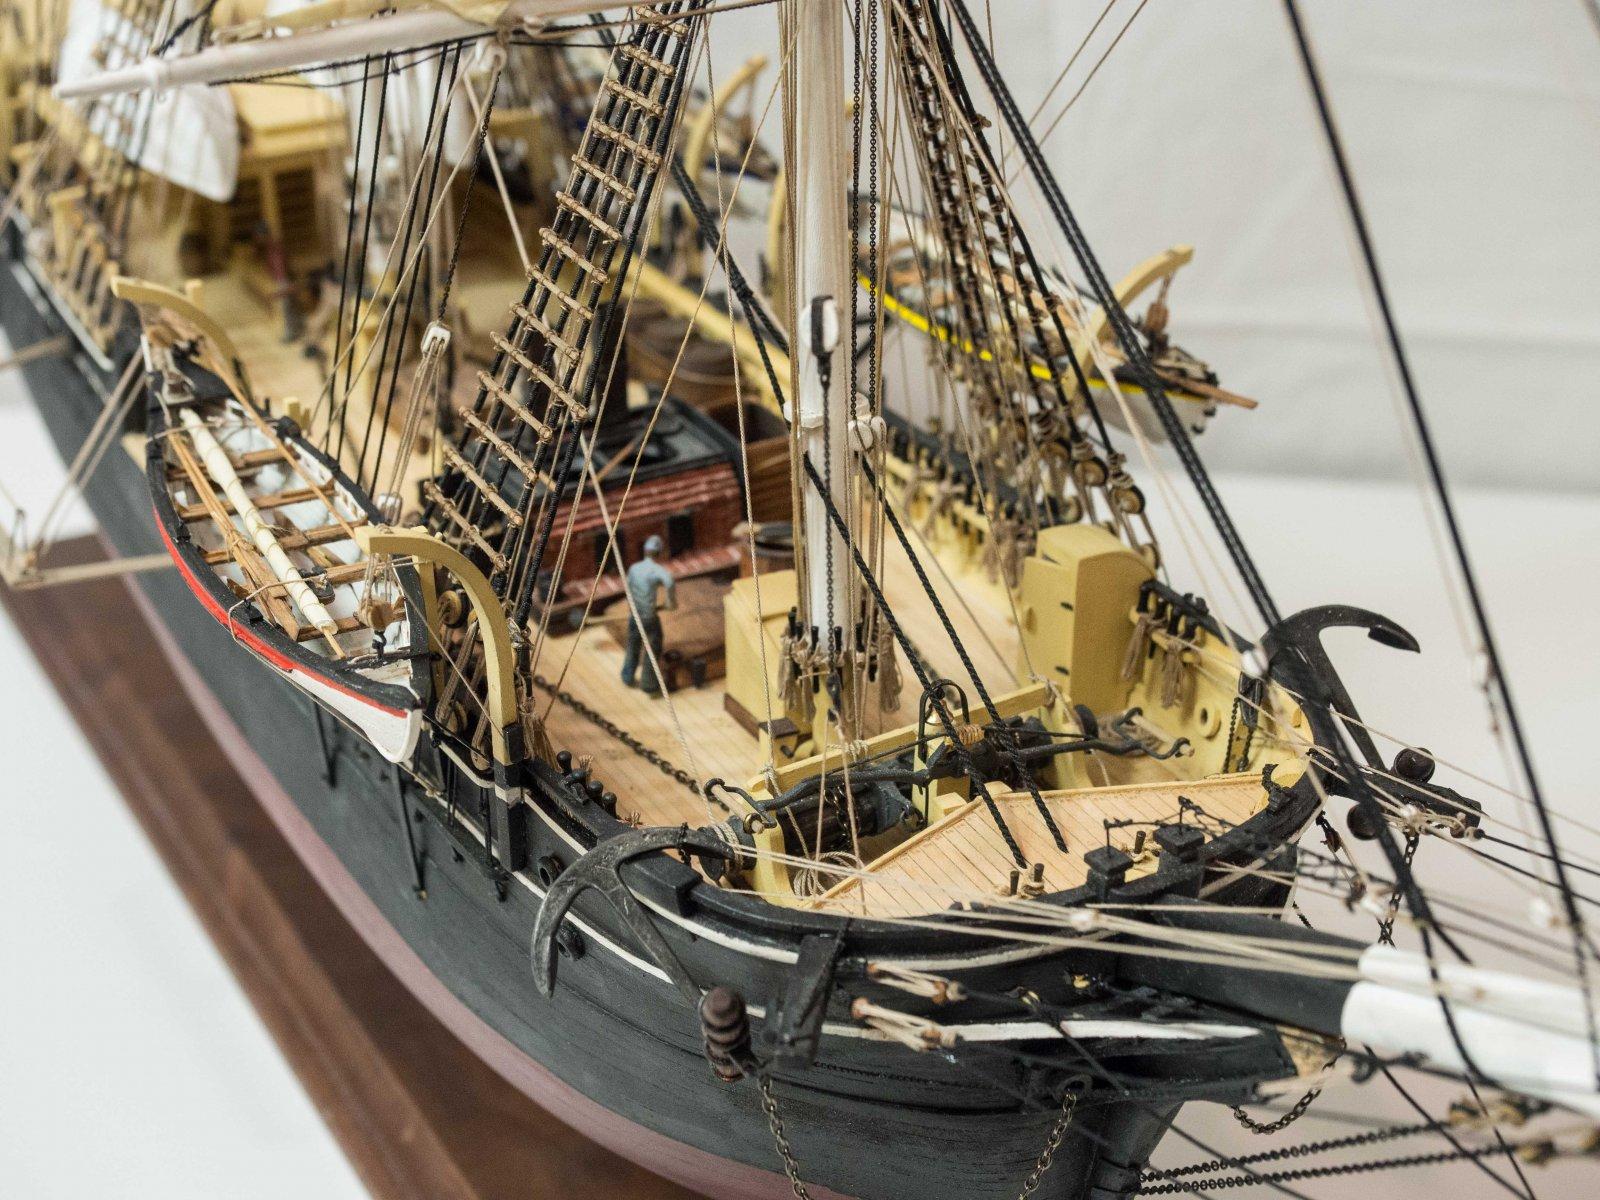 Starboard front quarter close-up